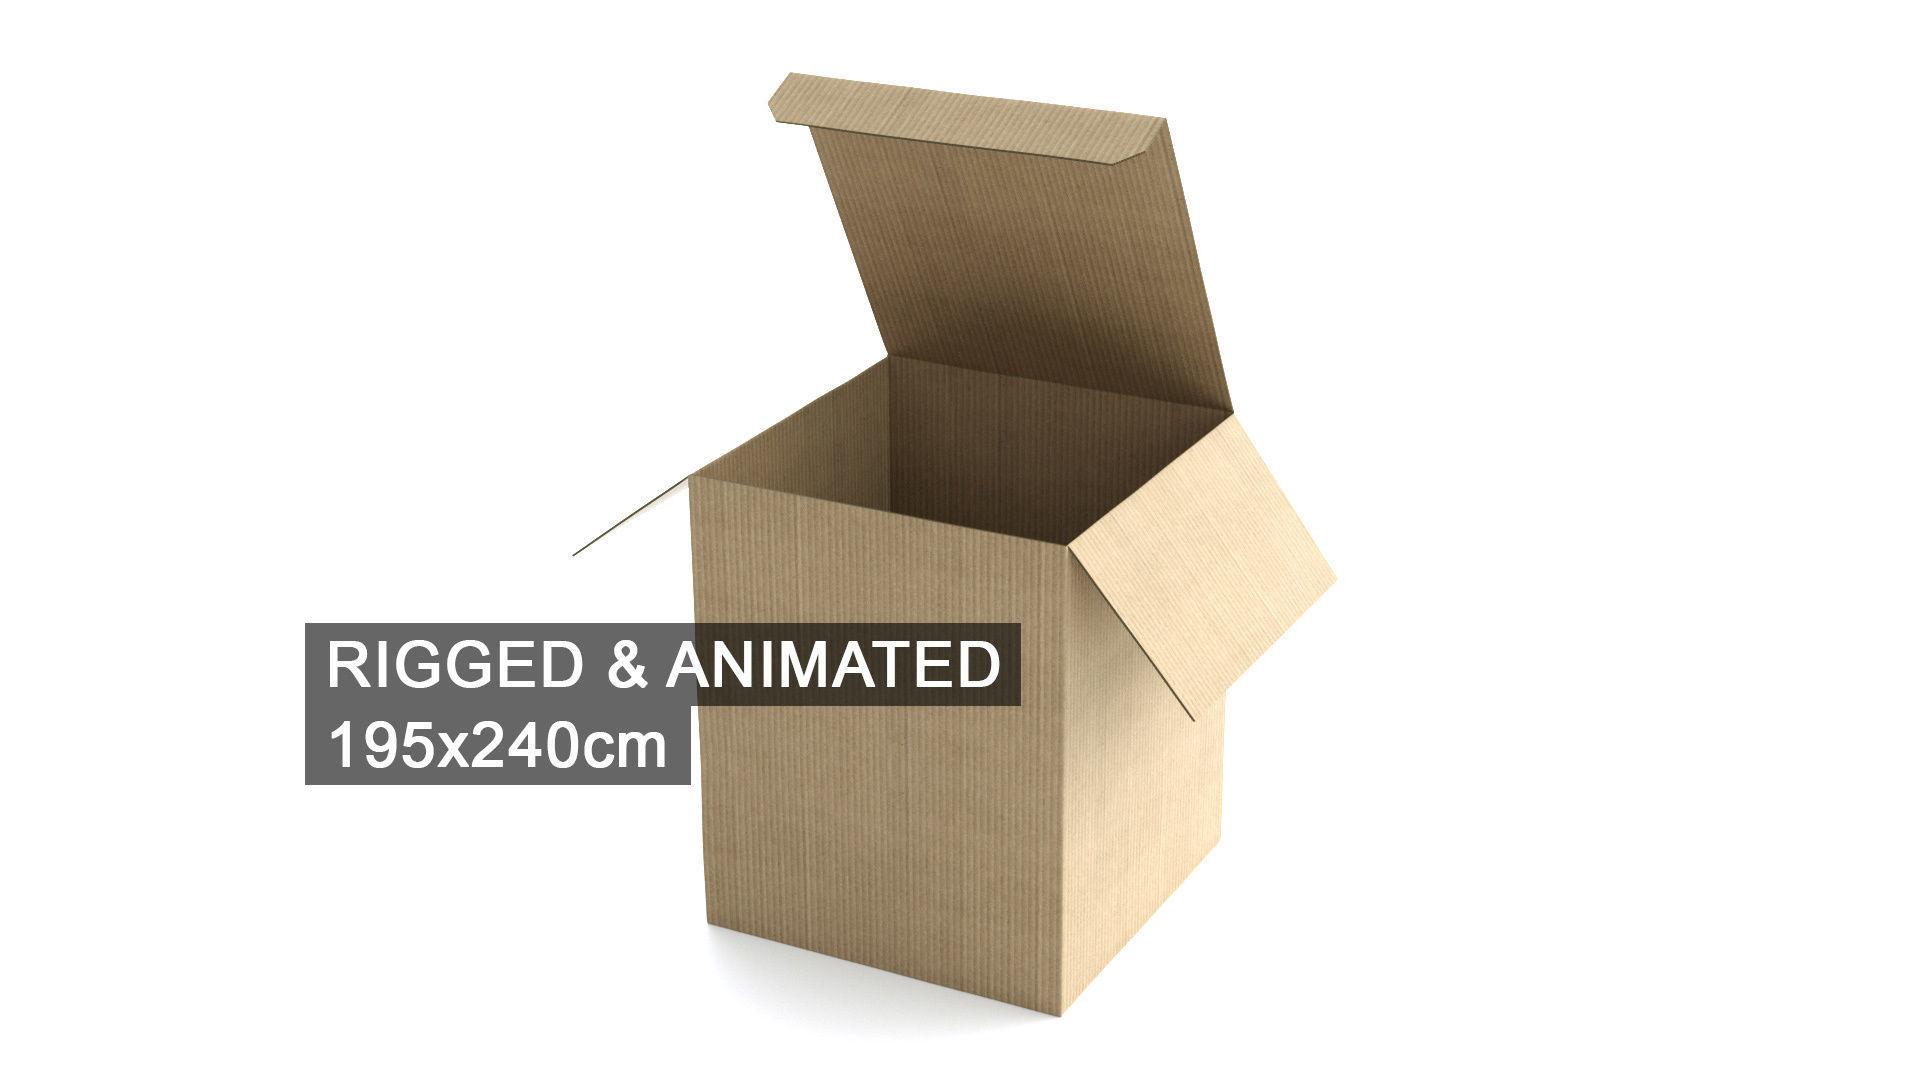 Cardboard Box 195x240cm - Rigged and Animated